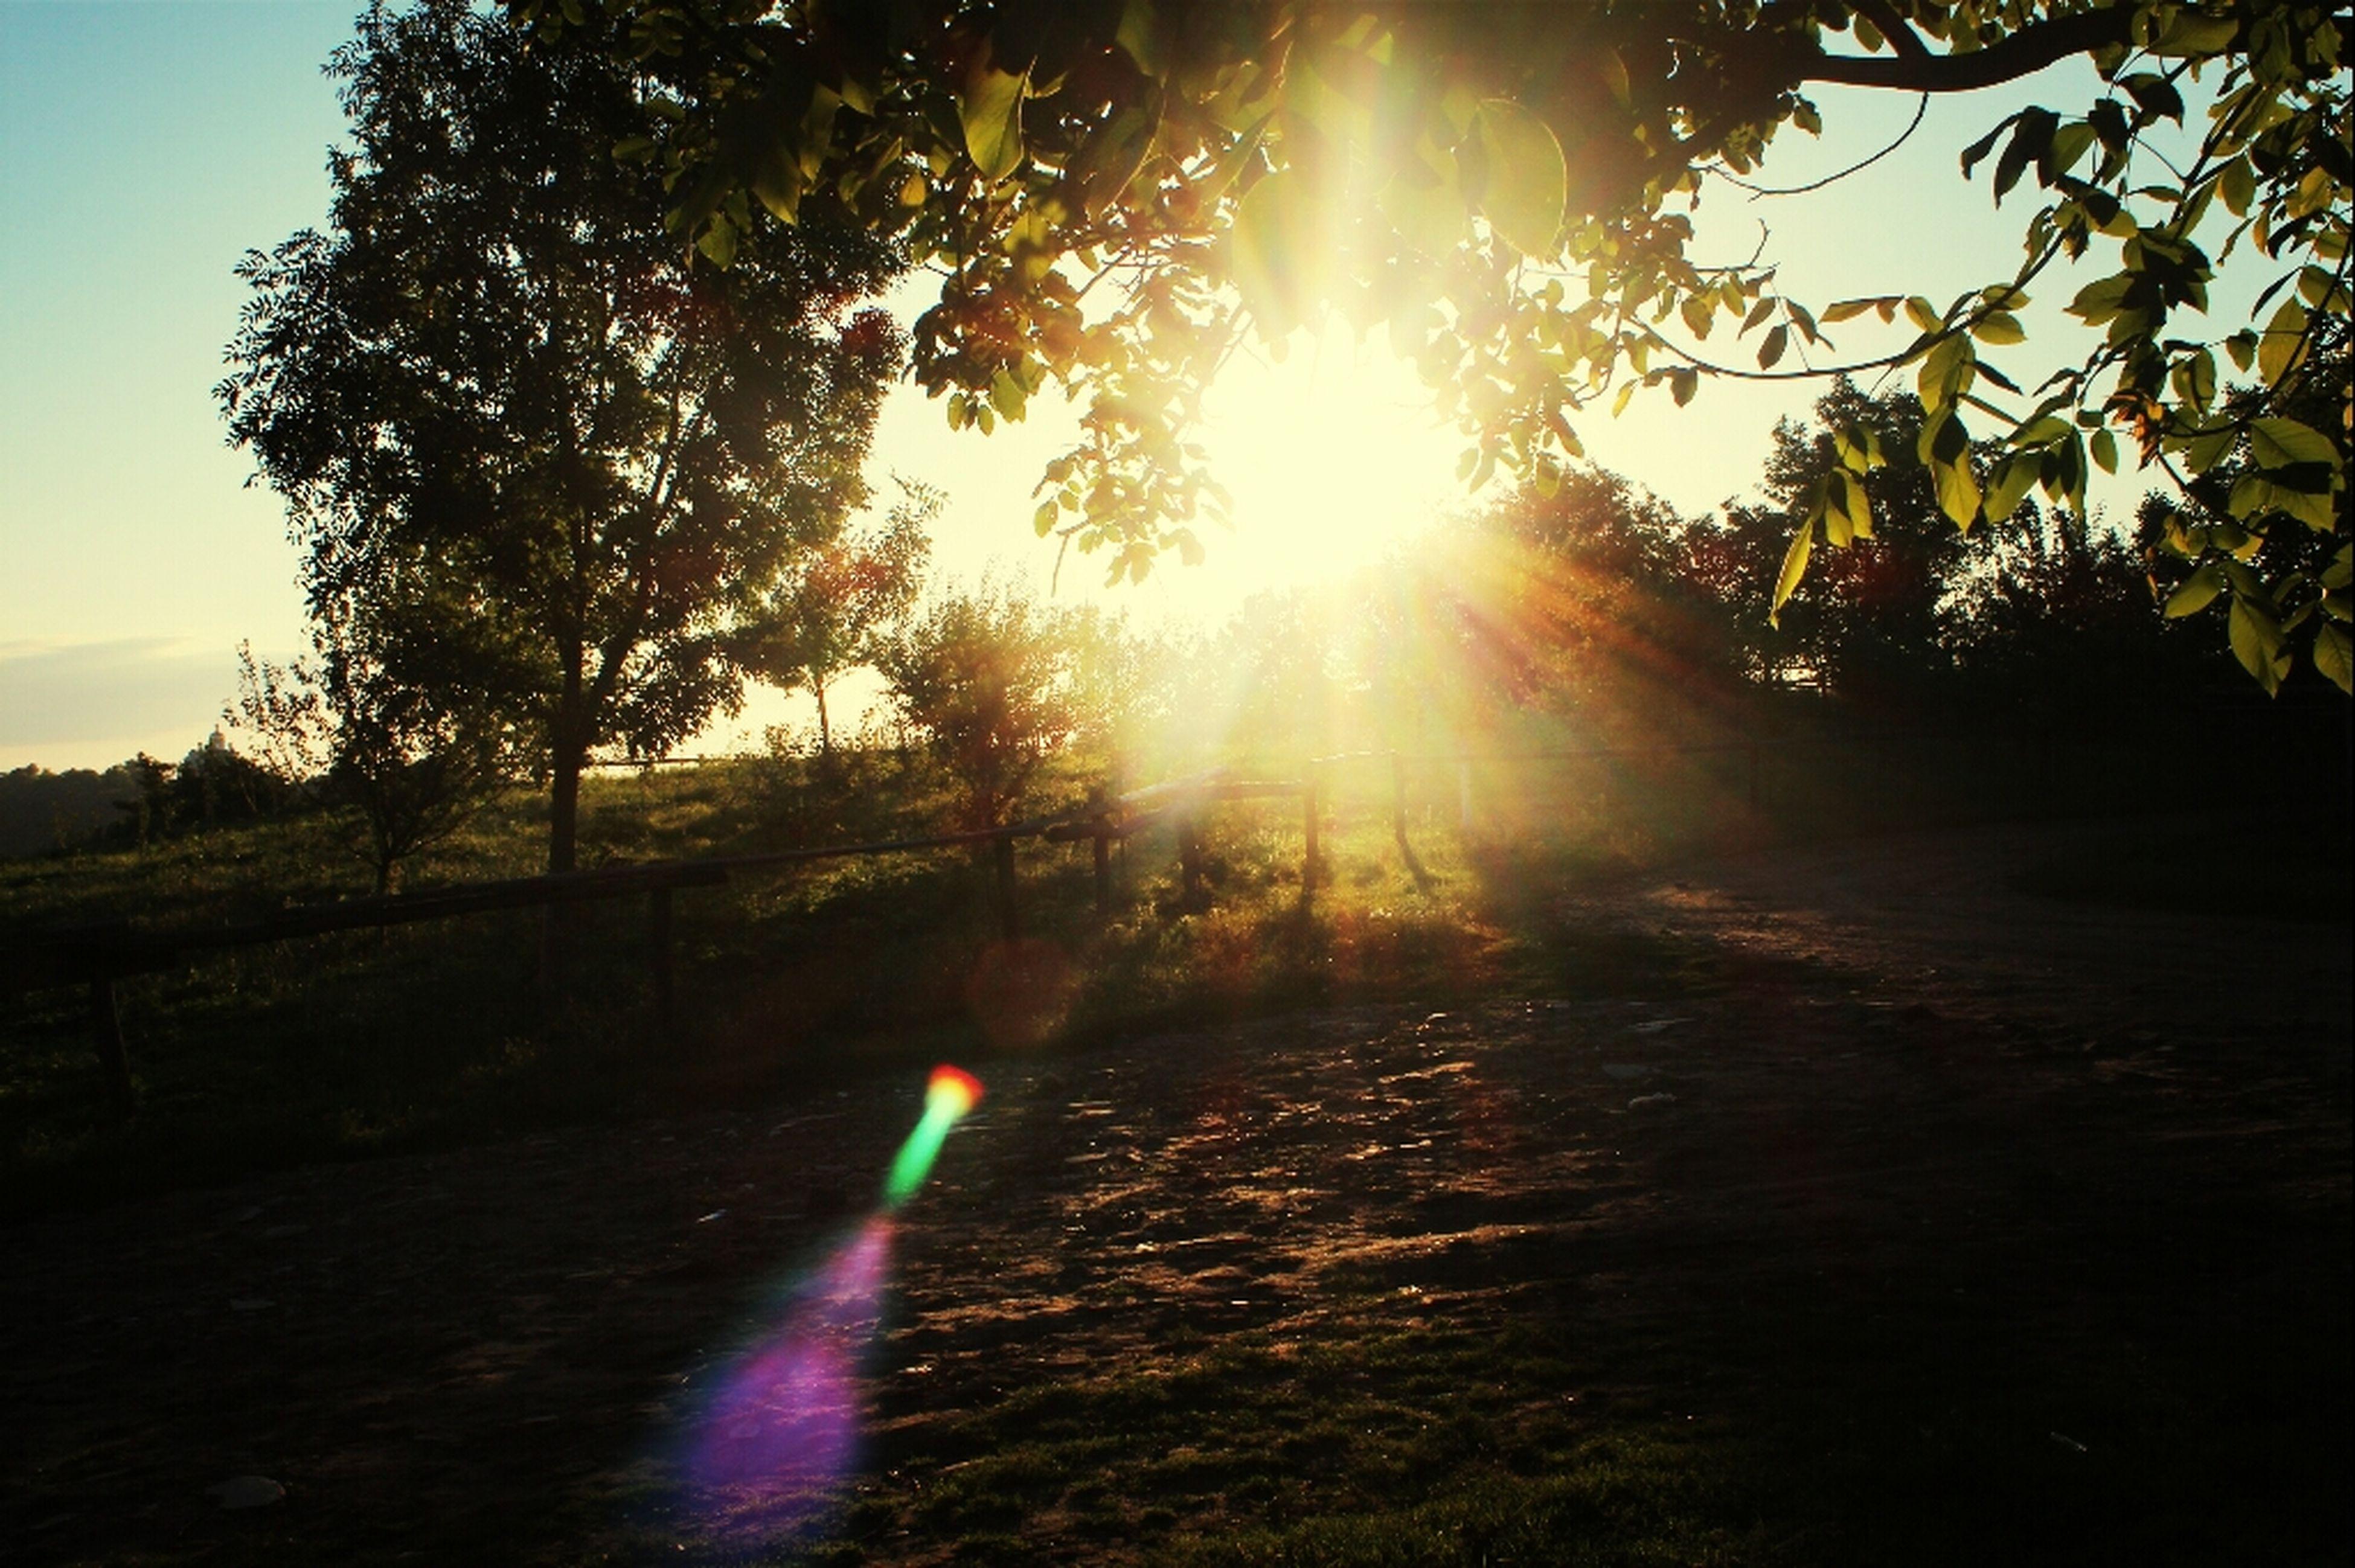 sun, sunbeam, sunlight, lens flare, tree, tranquility, sunset, tranquil scene, nature, scenics, beauty in nature, sky, landscape, sunny, bright, back lit, outdoors, no people, idyllic, non-urban scene